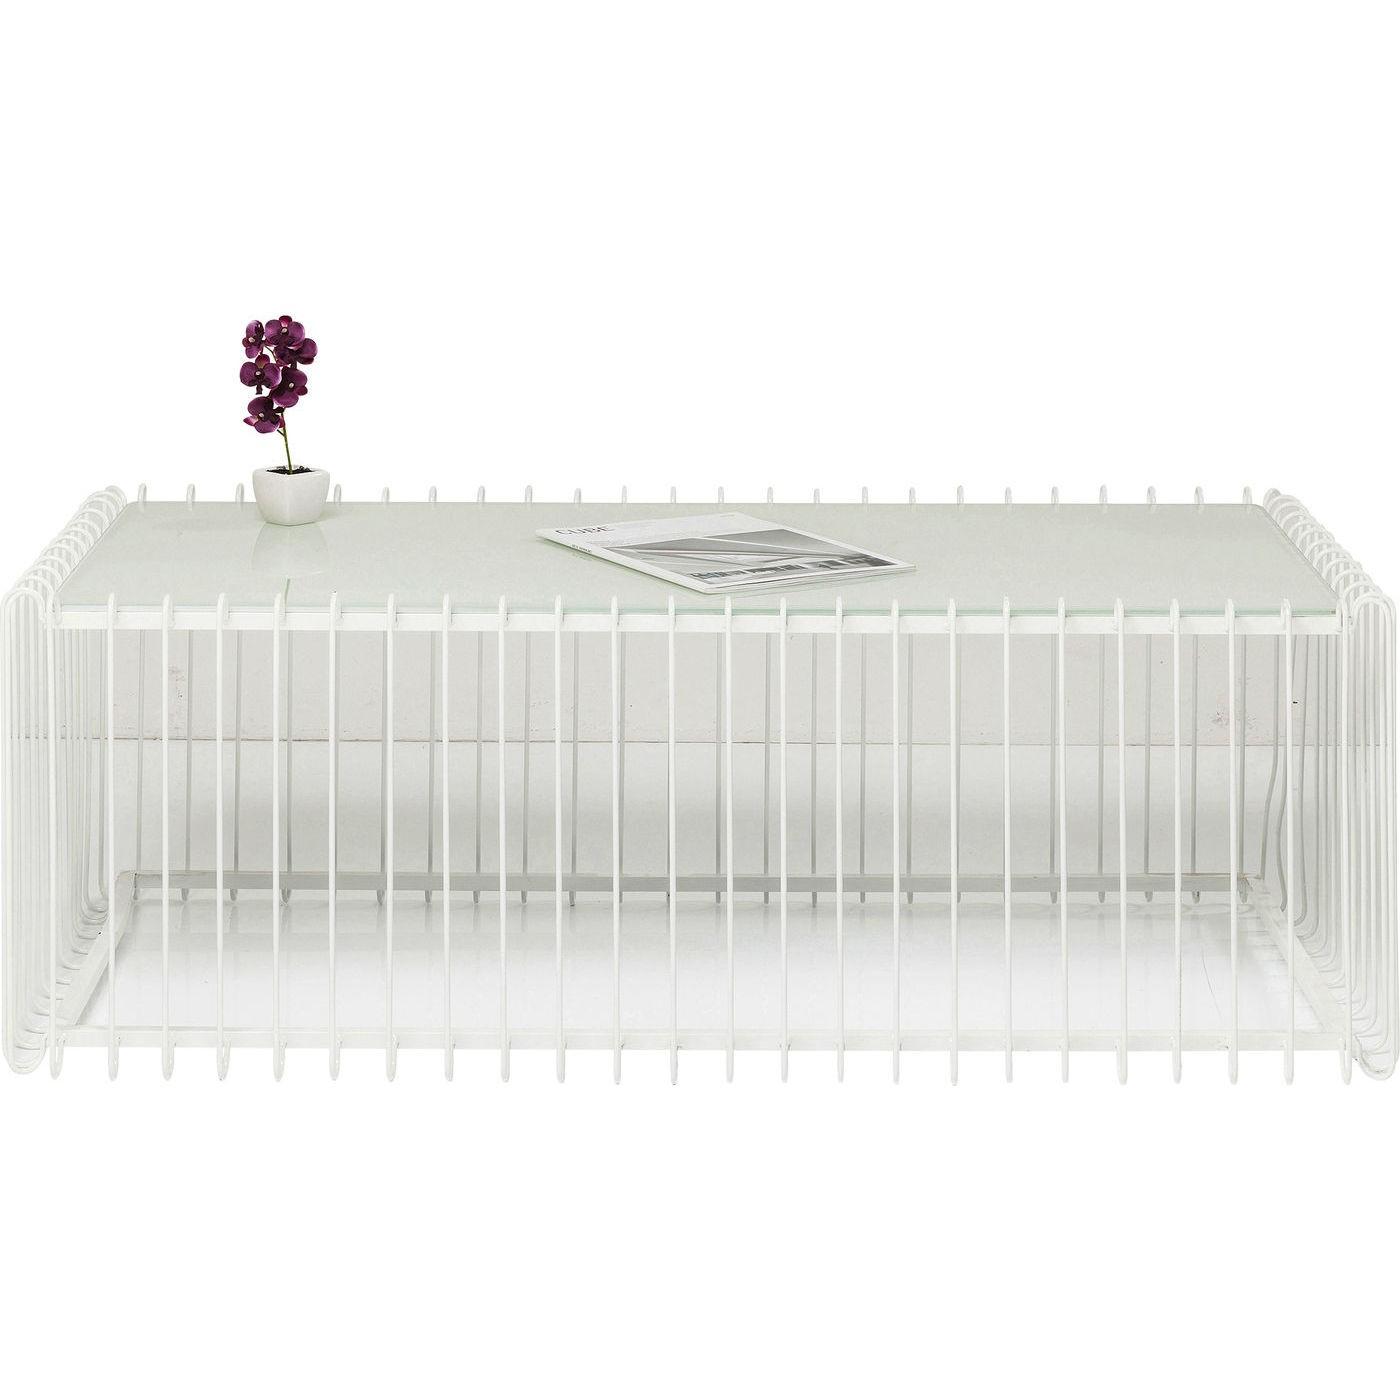 Sofabord Wire Rektangulær Hvid 115 x 57 cm